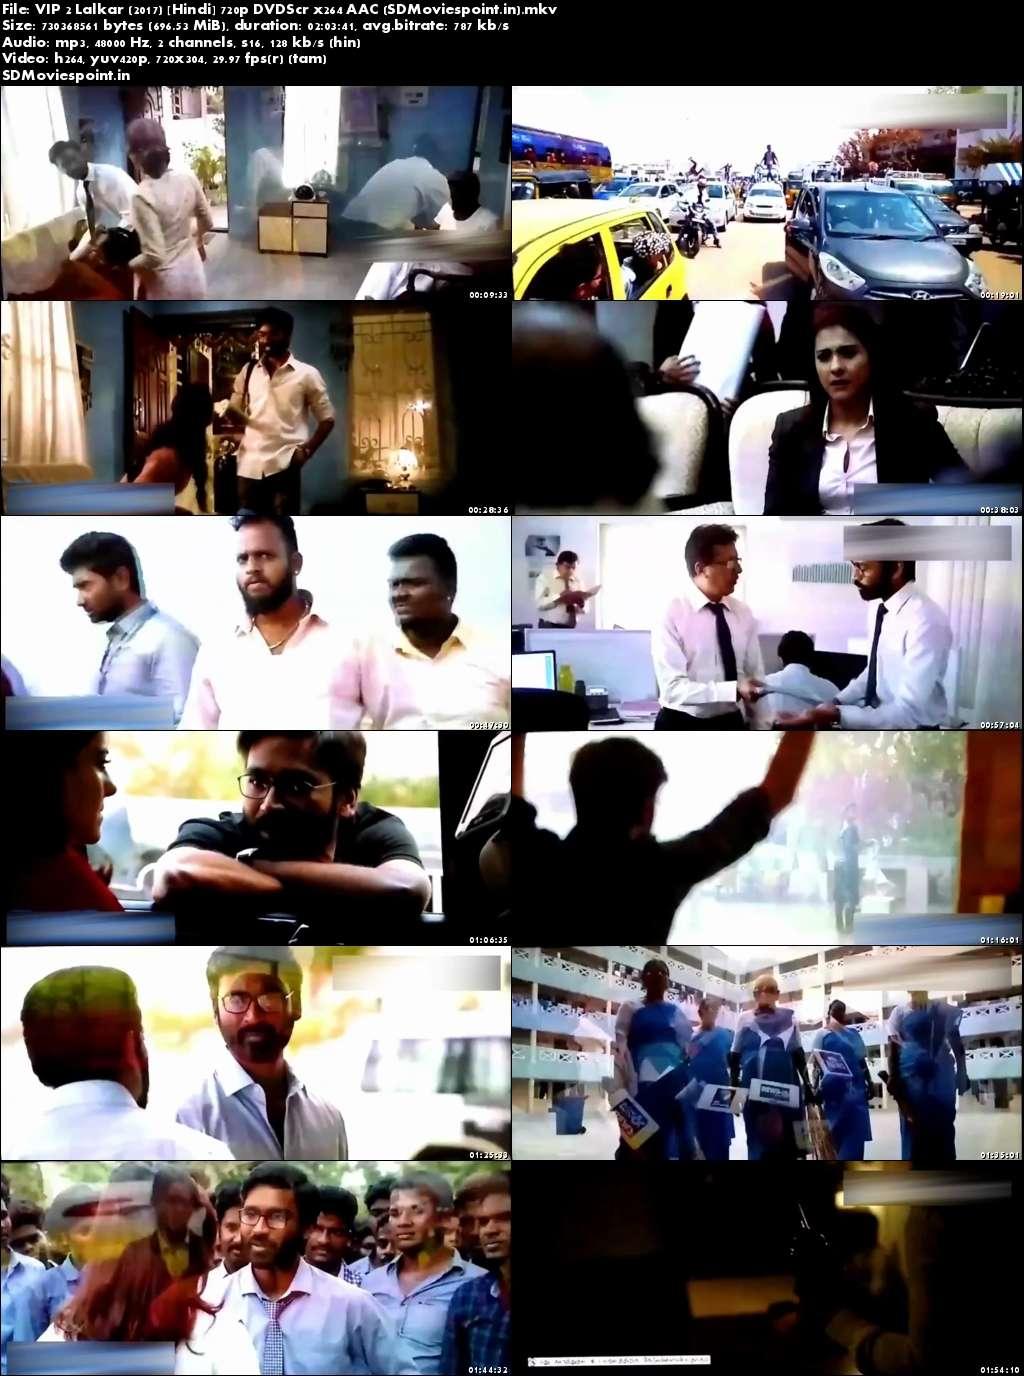 Screen Shots VIP 2 Lalkar (2017) Full HD Movie Download Free In Hindi 720p